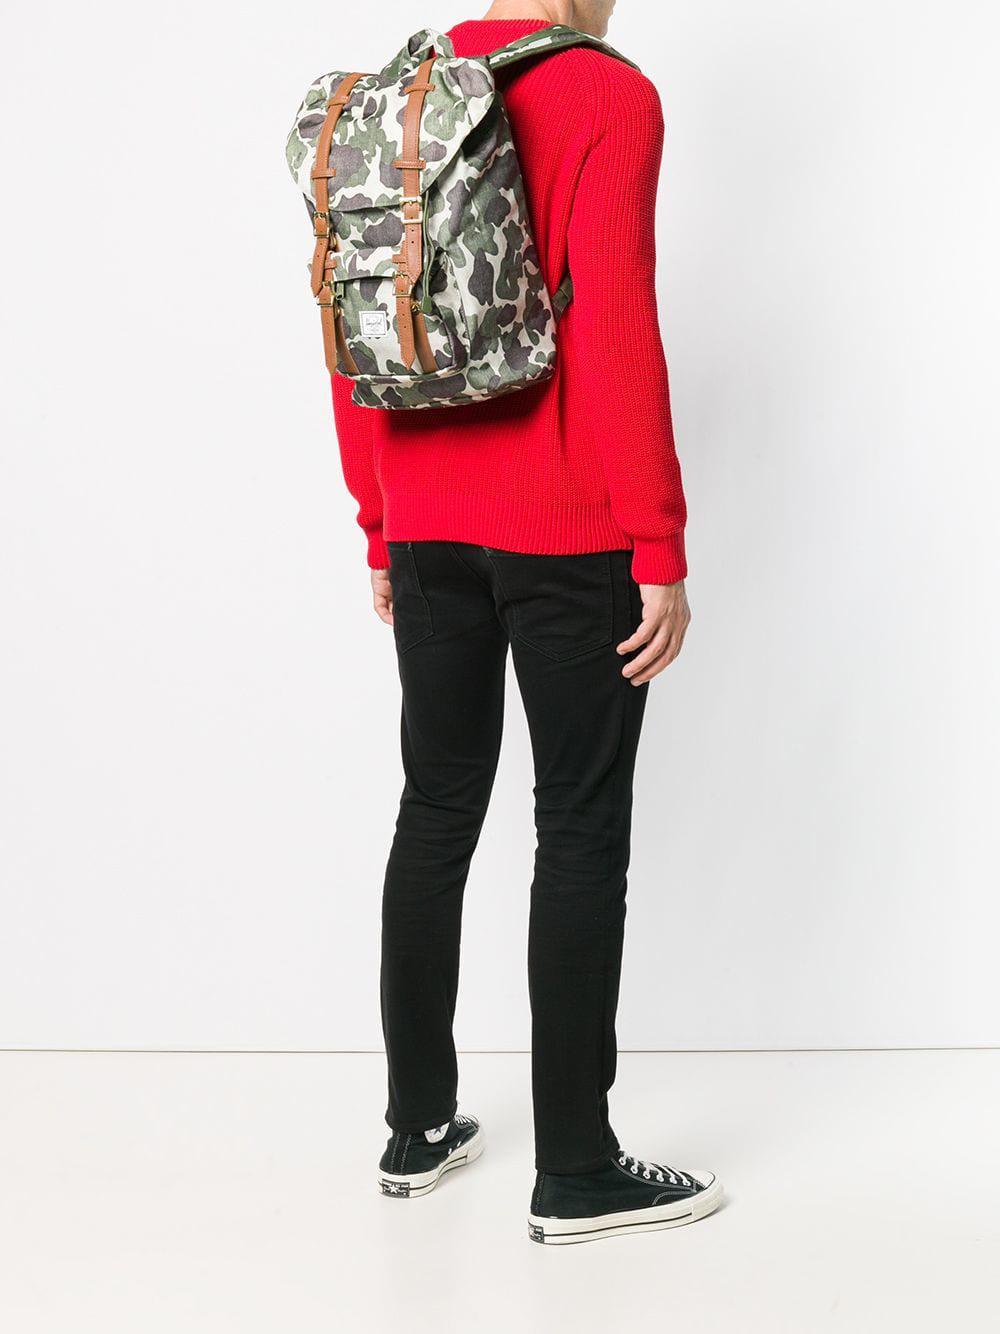 Herschel Supply Co. - Green Little America Men s Backpack In Multicolour  for Men - Lyst. View fullscreen 87417726fe